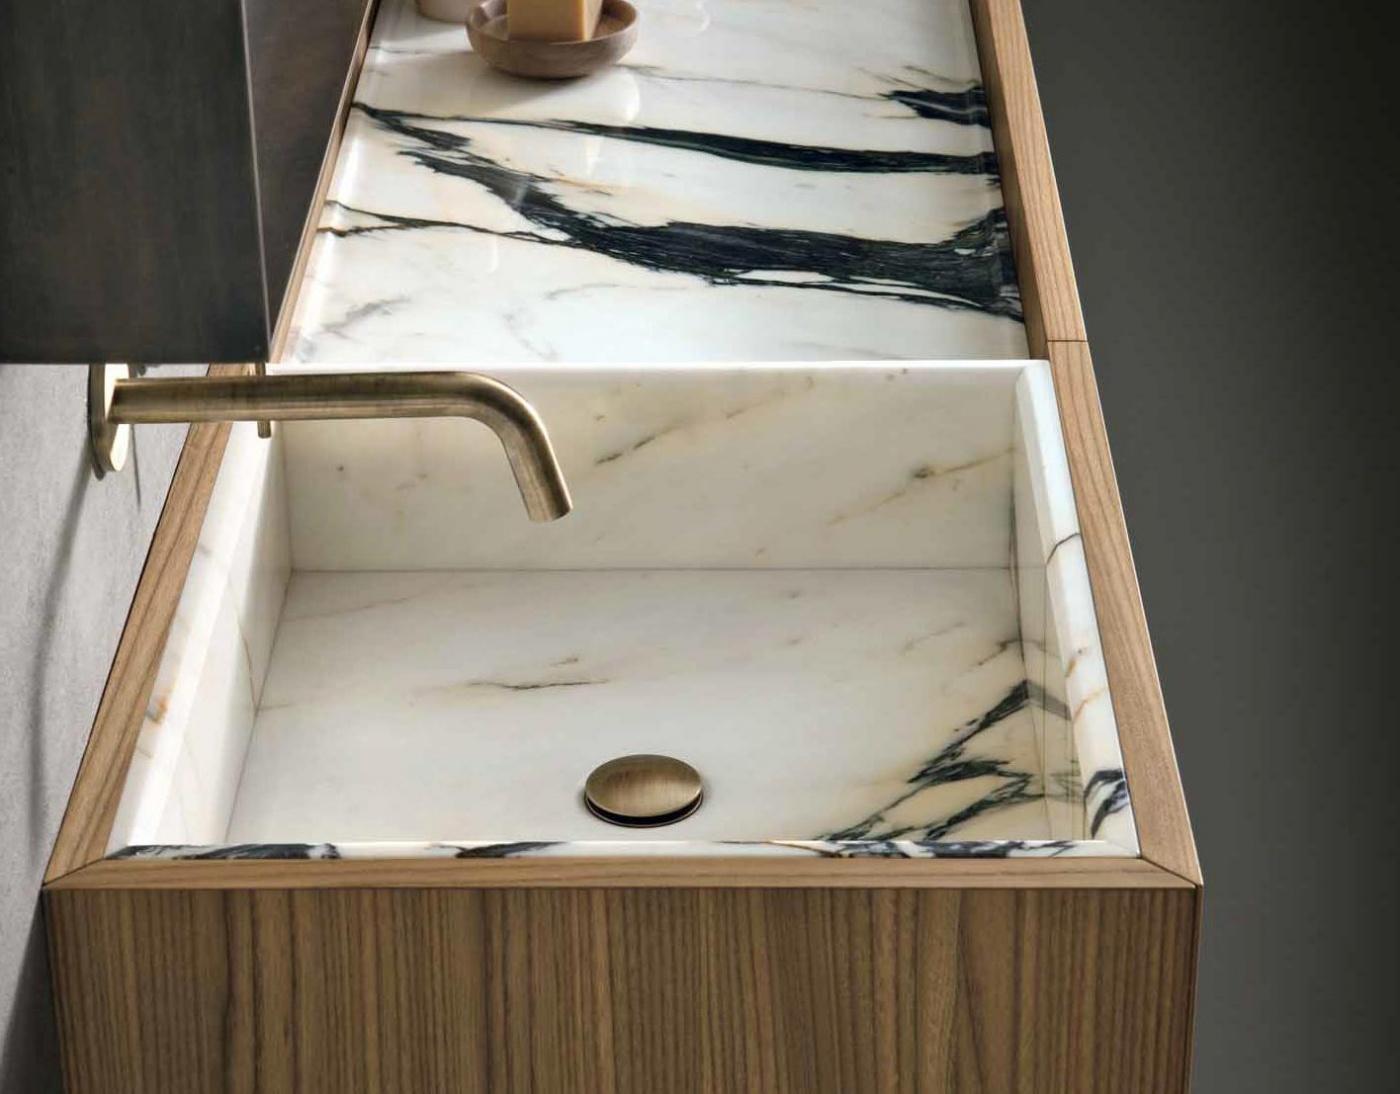 Vasque et Plan Calacata Paonazzetto. Meuble et robinet Altamarea Must (design Willy Dalto)